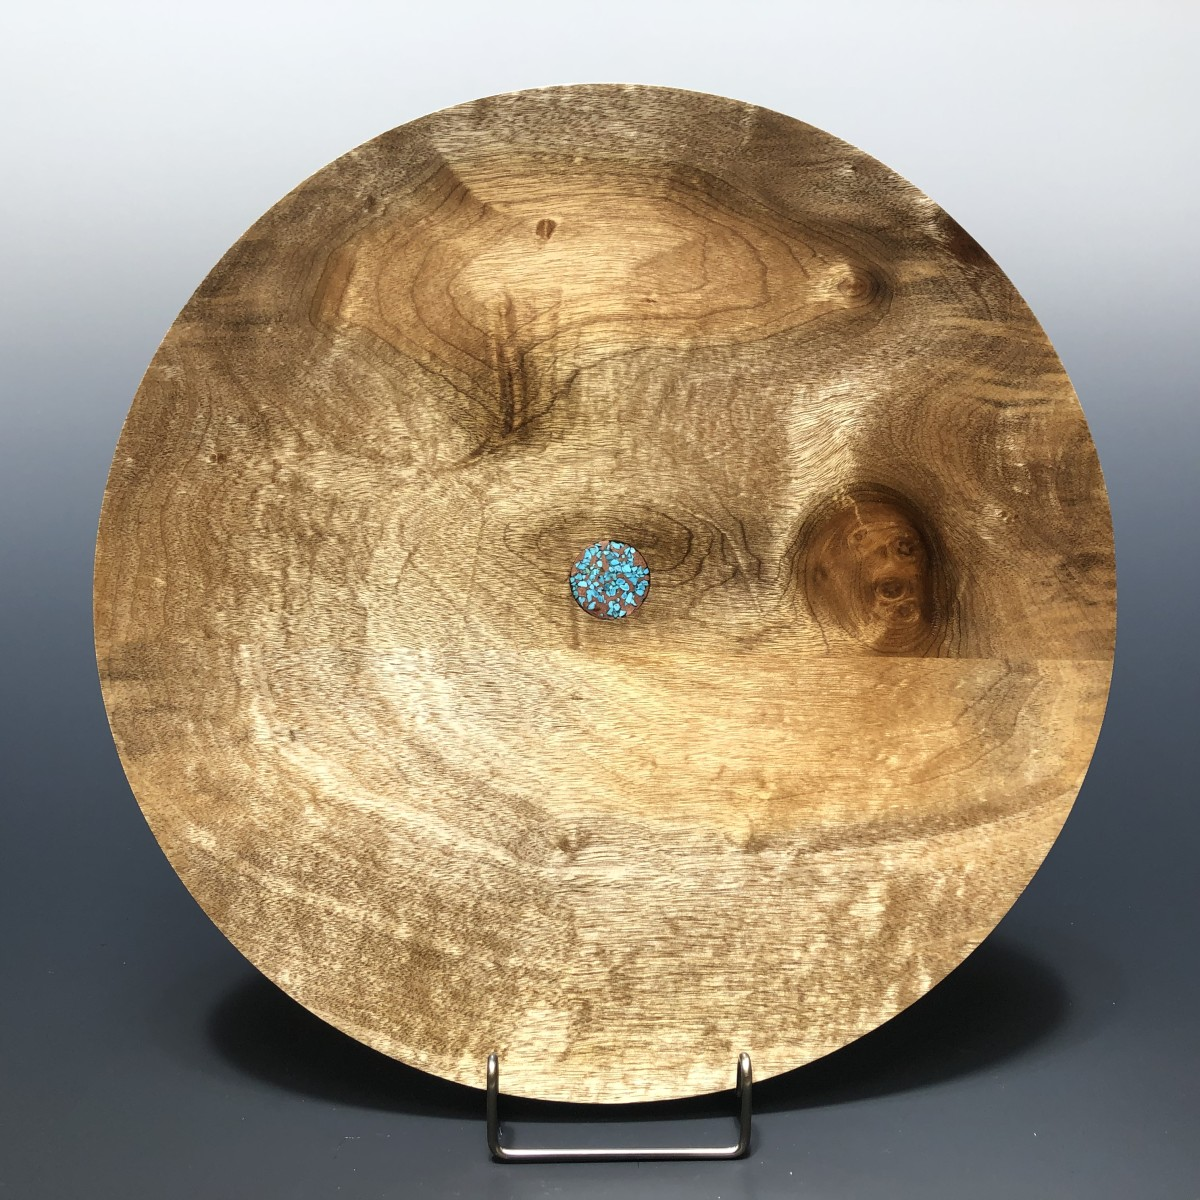 Myrtle Wood Platter by John Andrew